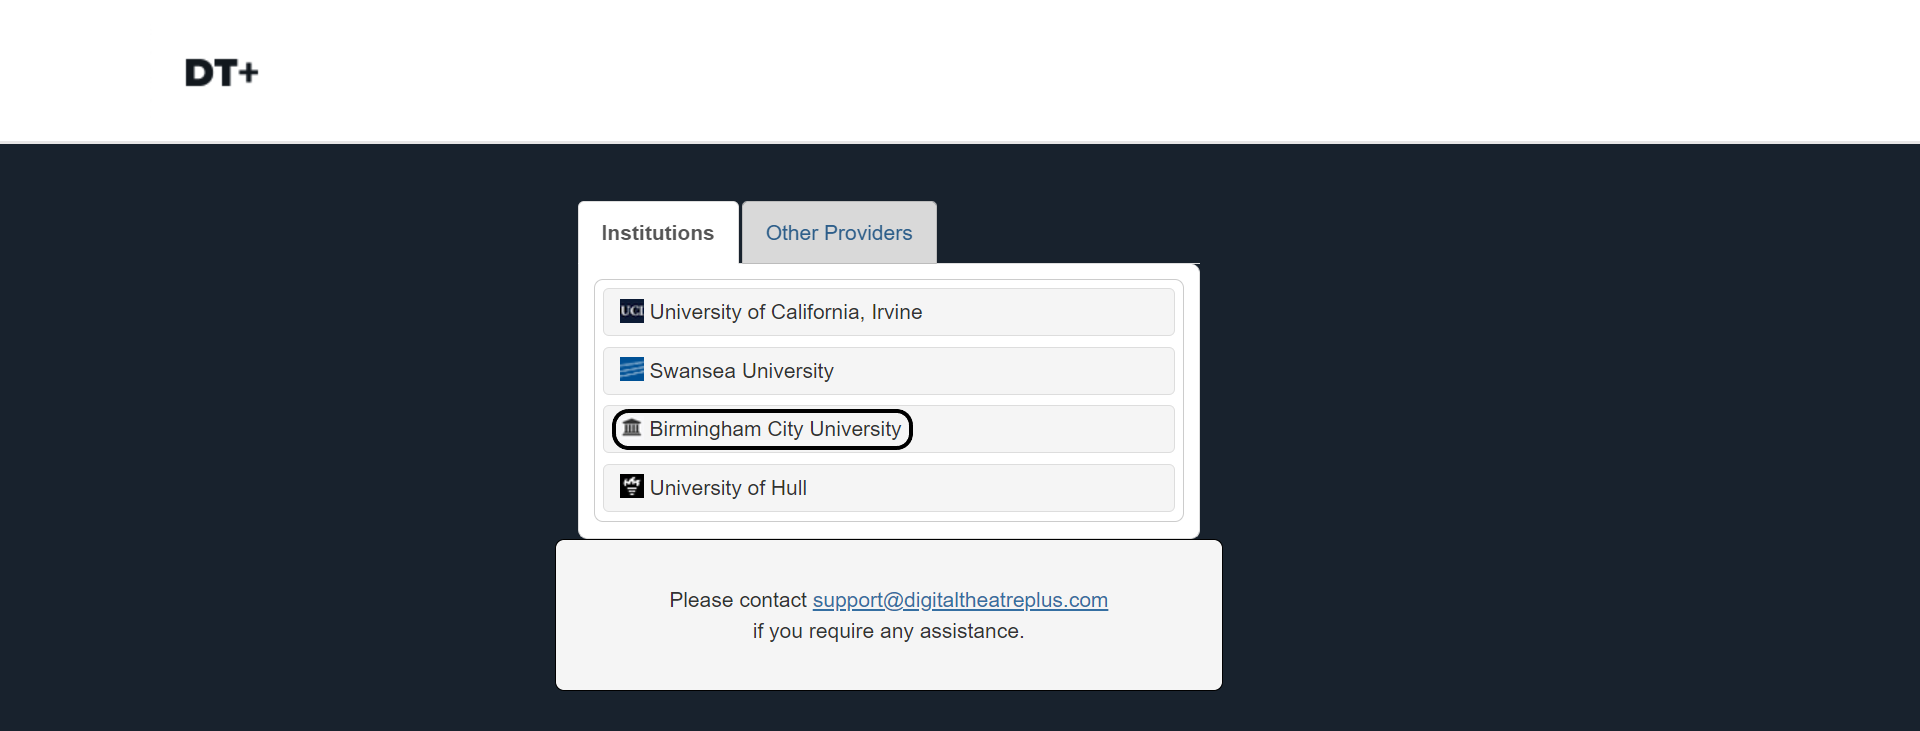 Select Birmingham City University as the institution